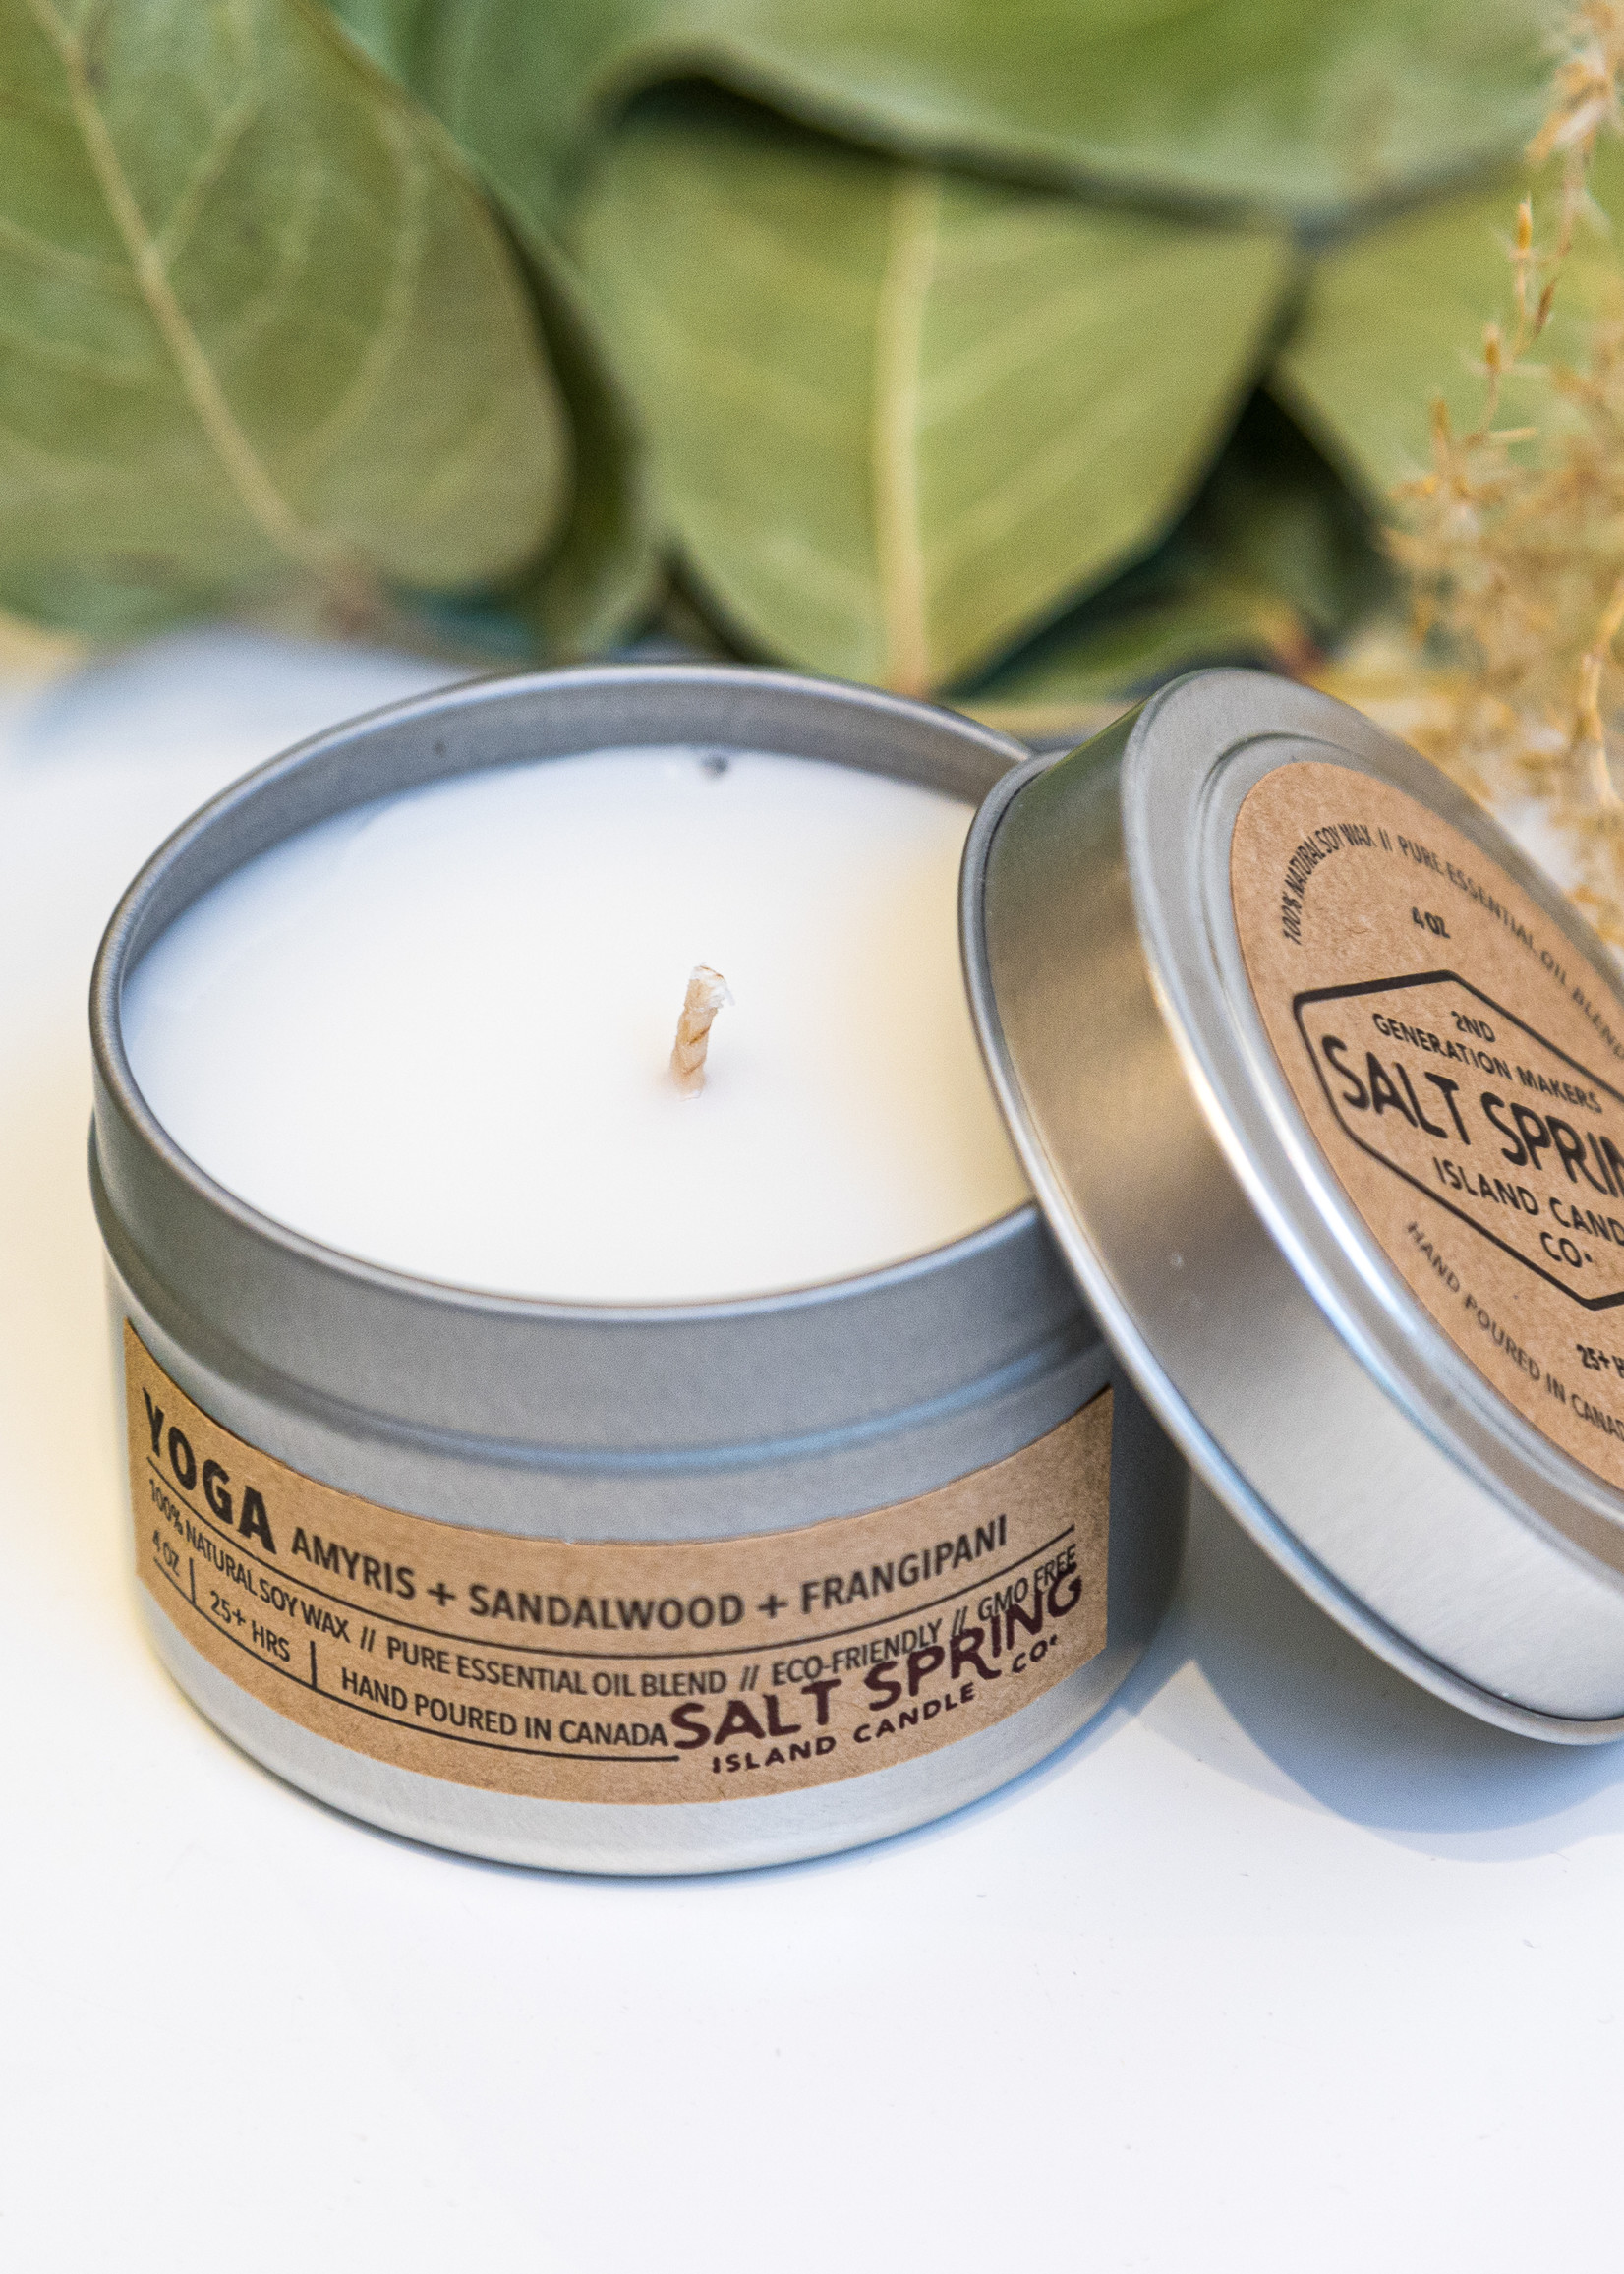 Salt Spring Island Candle Co. - Yoga 4 oz Candle